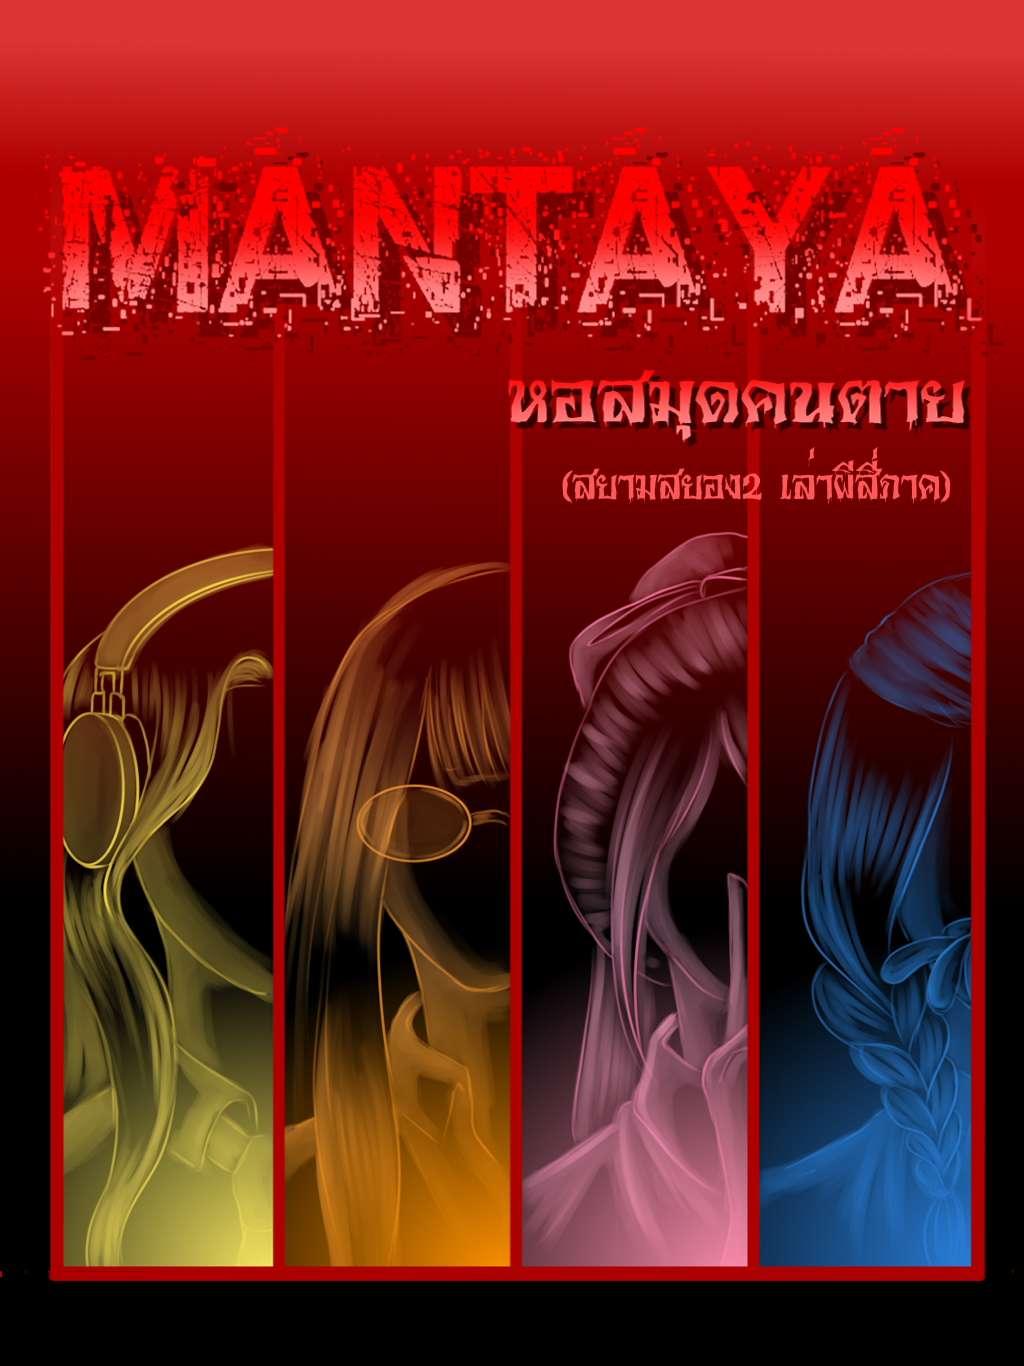 MANTAYA หอสมุดคนตาย(สยามสยอง2 เล่าผีสี่ภาค)